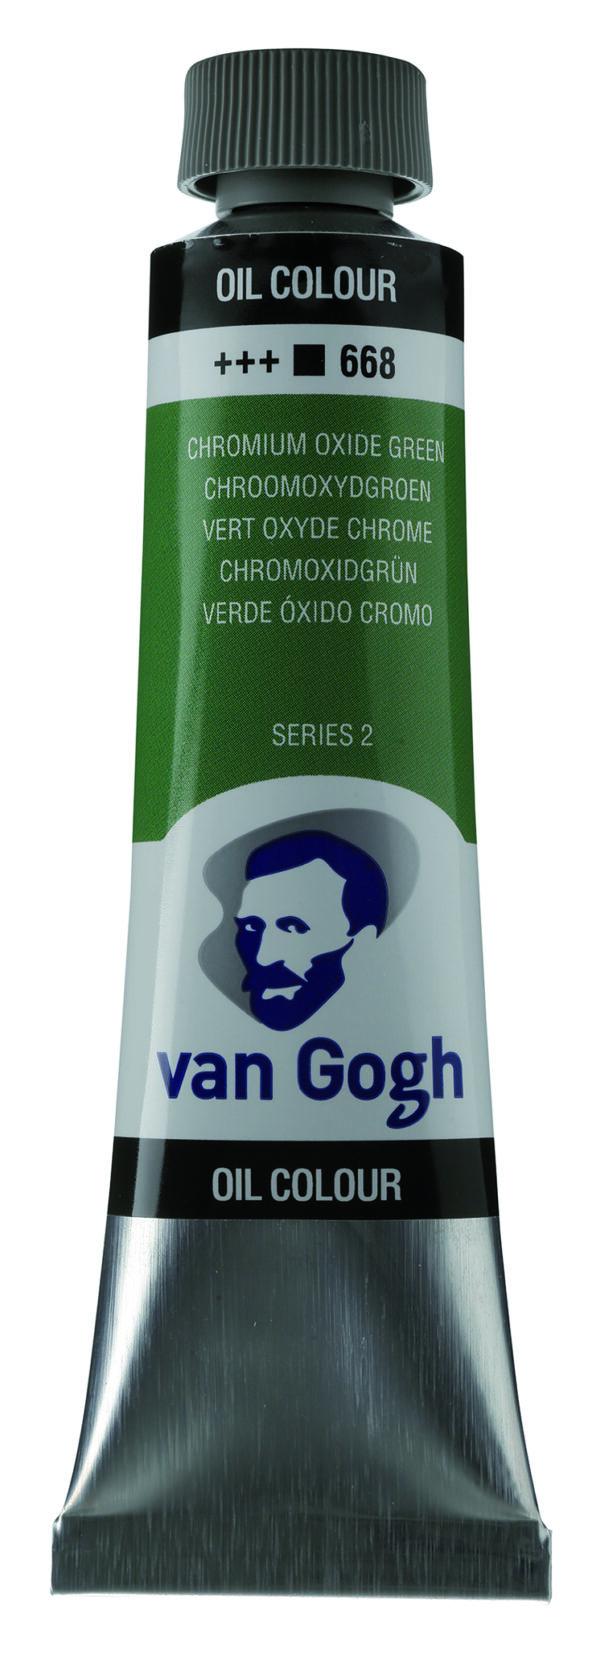 Van Gogh 668 Chromium oxide green - 40 ml